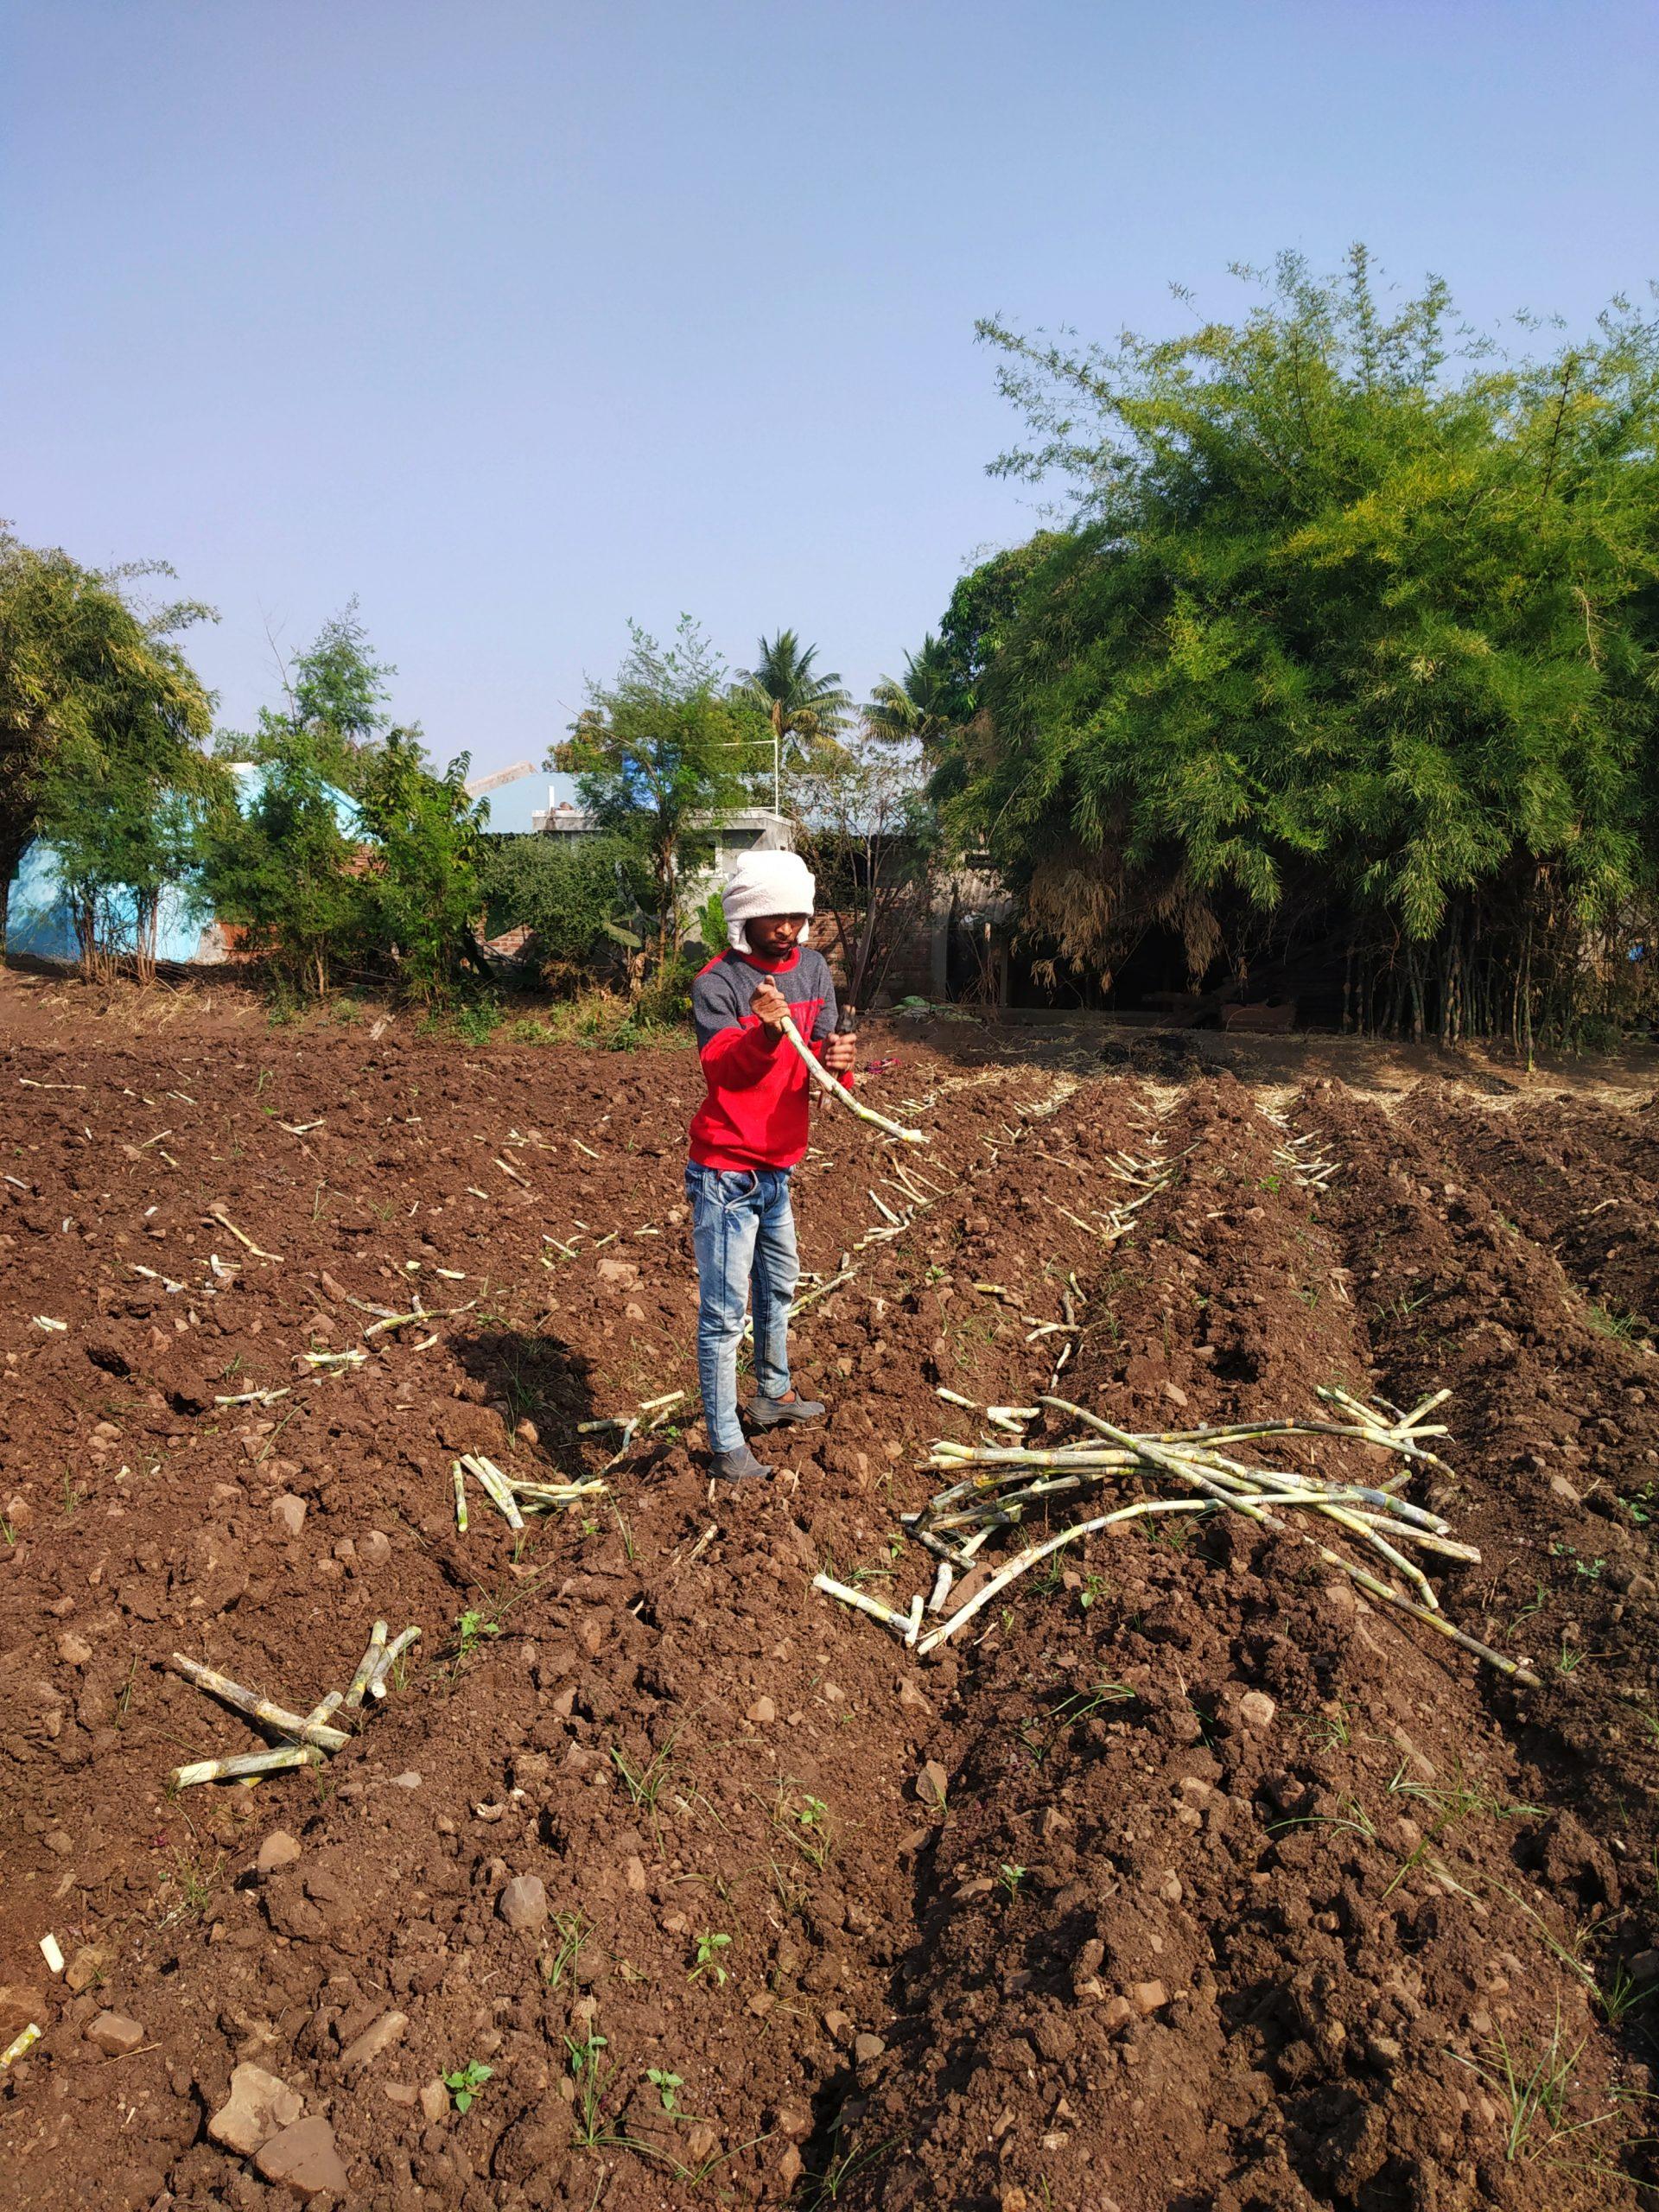 Farmer plowing Sugar cane in the field